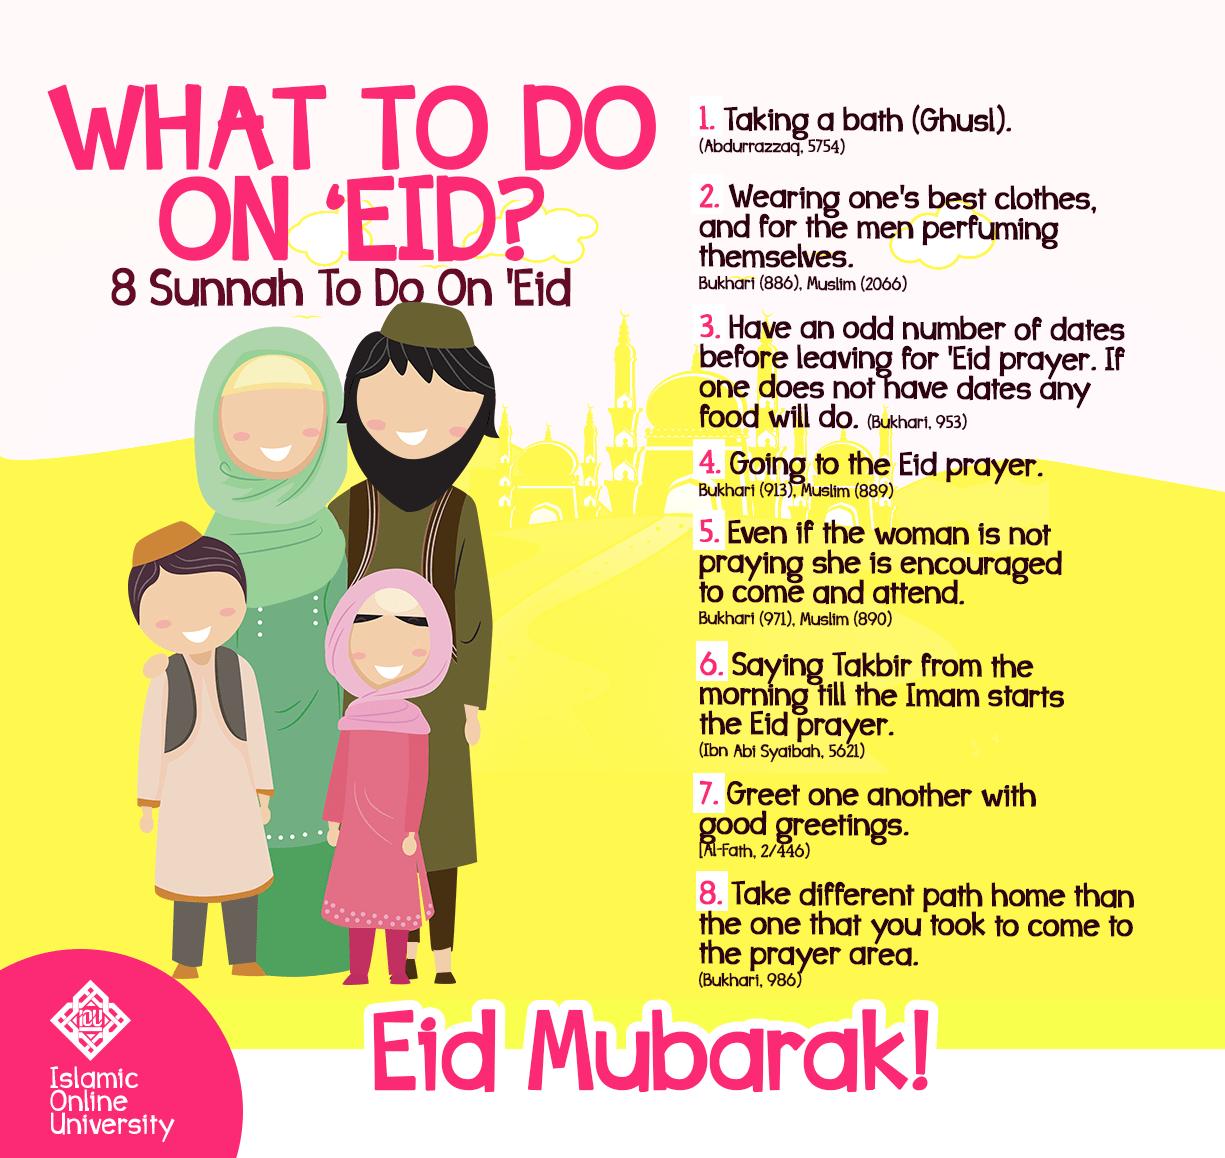 3 Simple Steps To Make Eid Exciting For Our Kids Free Eid Card Templates Mama Teaches Me Eid Prayer Eid Card Template Eid